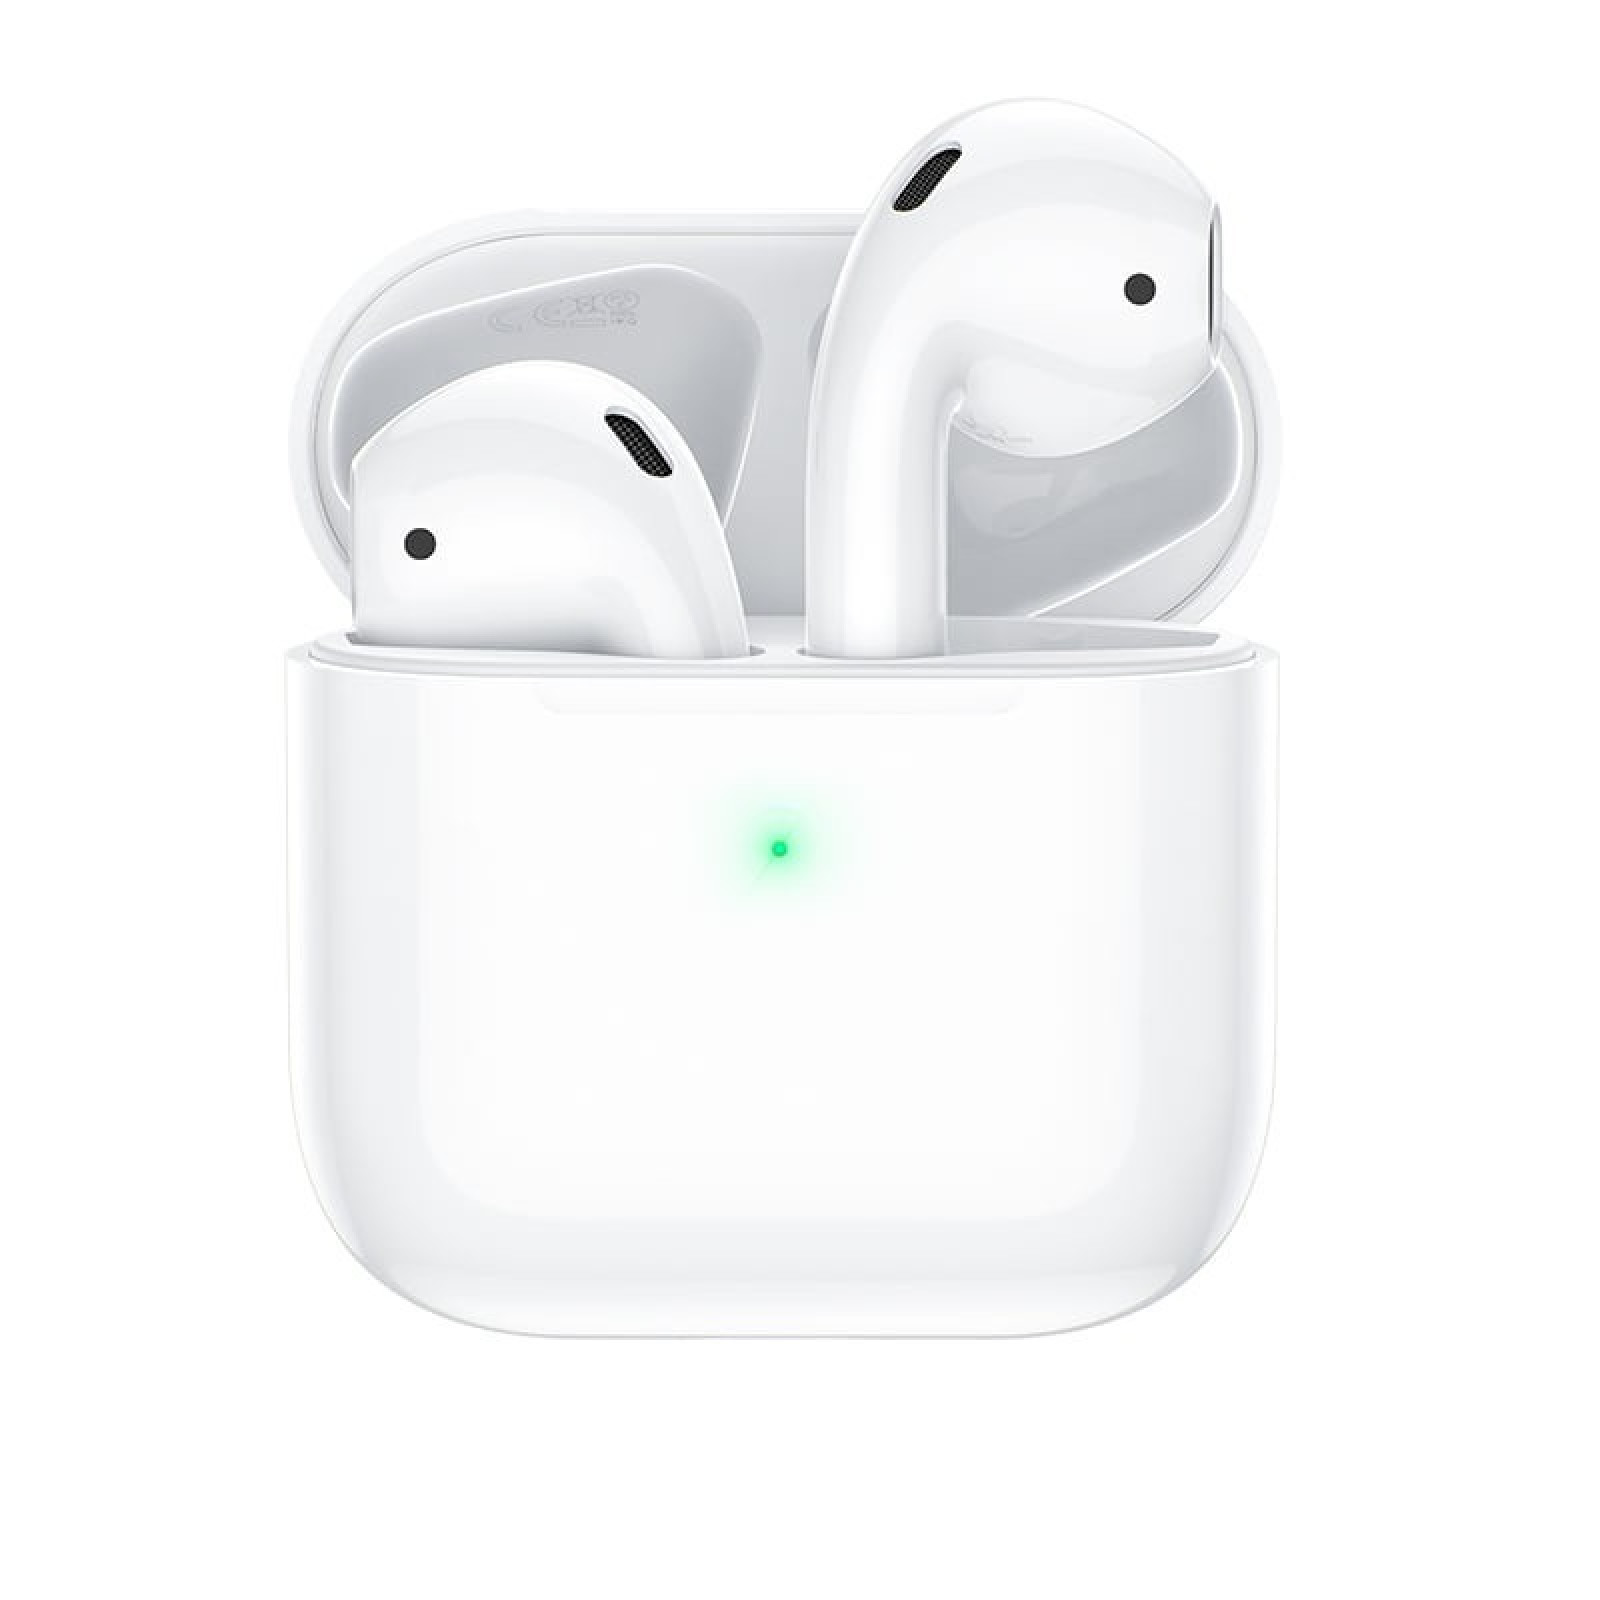 Bluetooth слушалки Hoco EW03 Original series true wireless BT headset - Бели